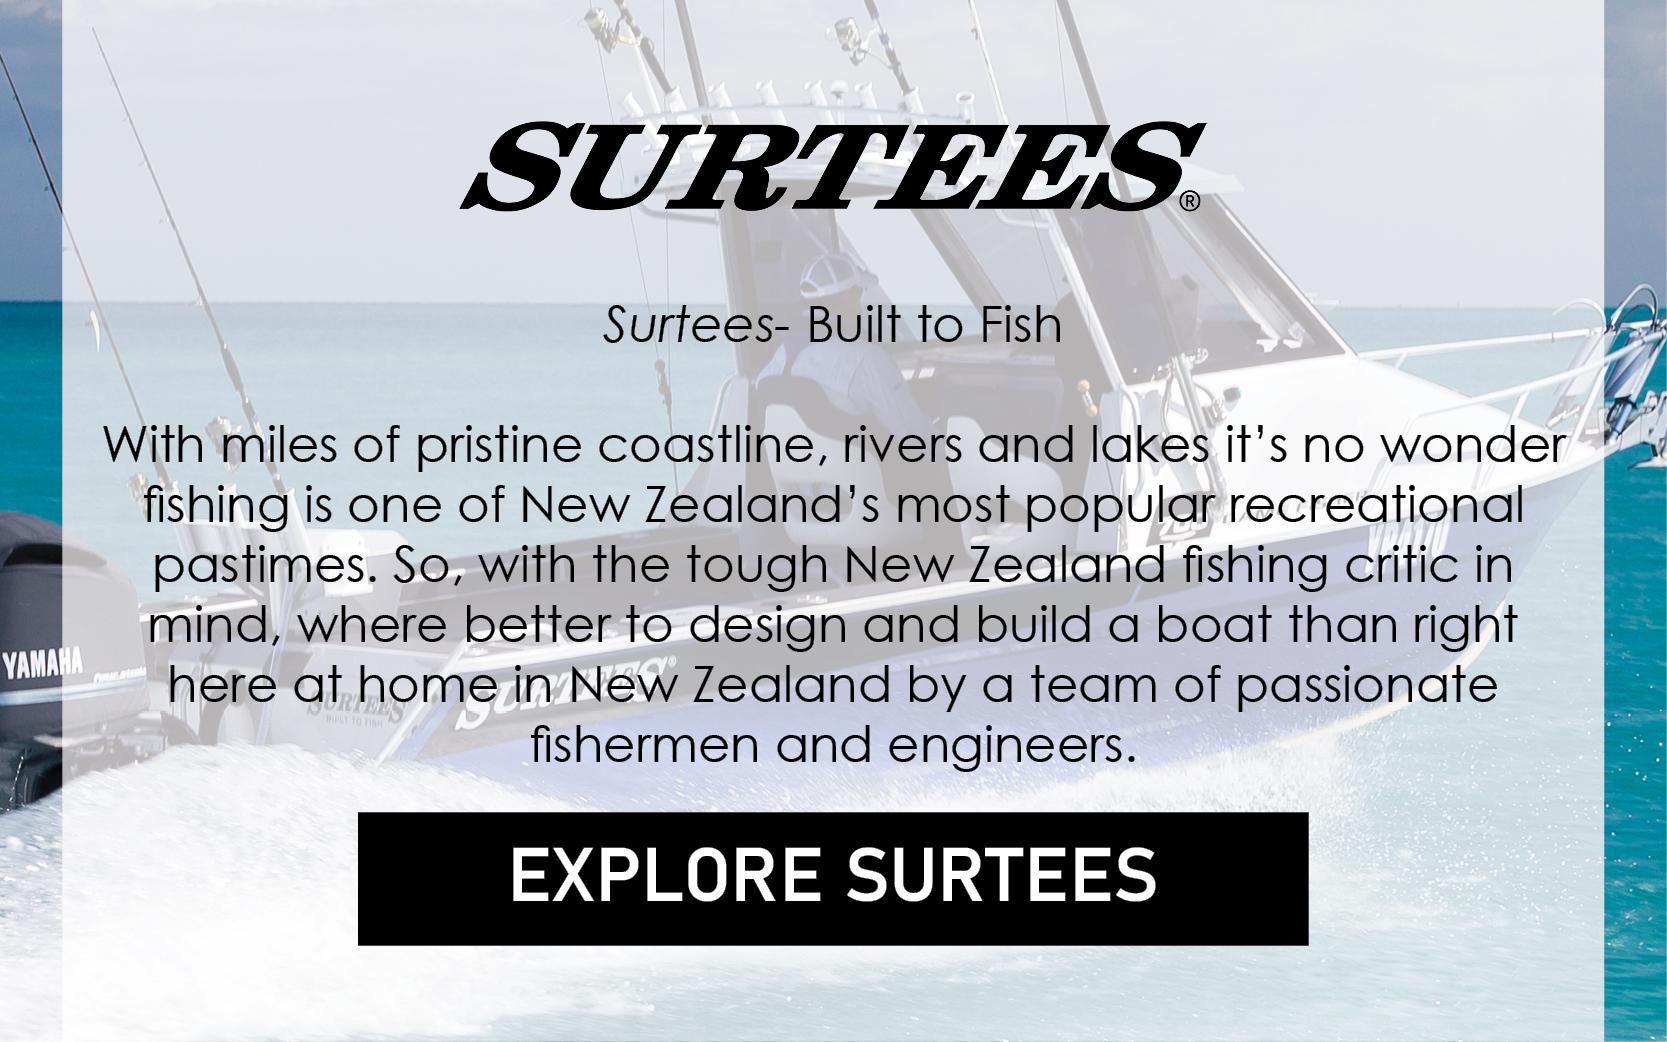 Surtees: Built to Fish.